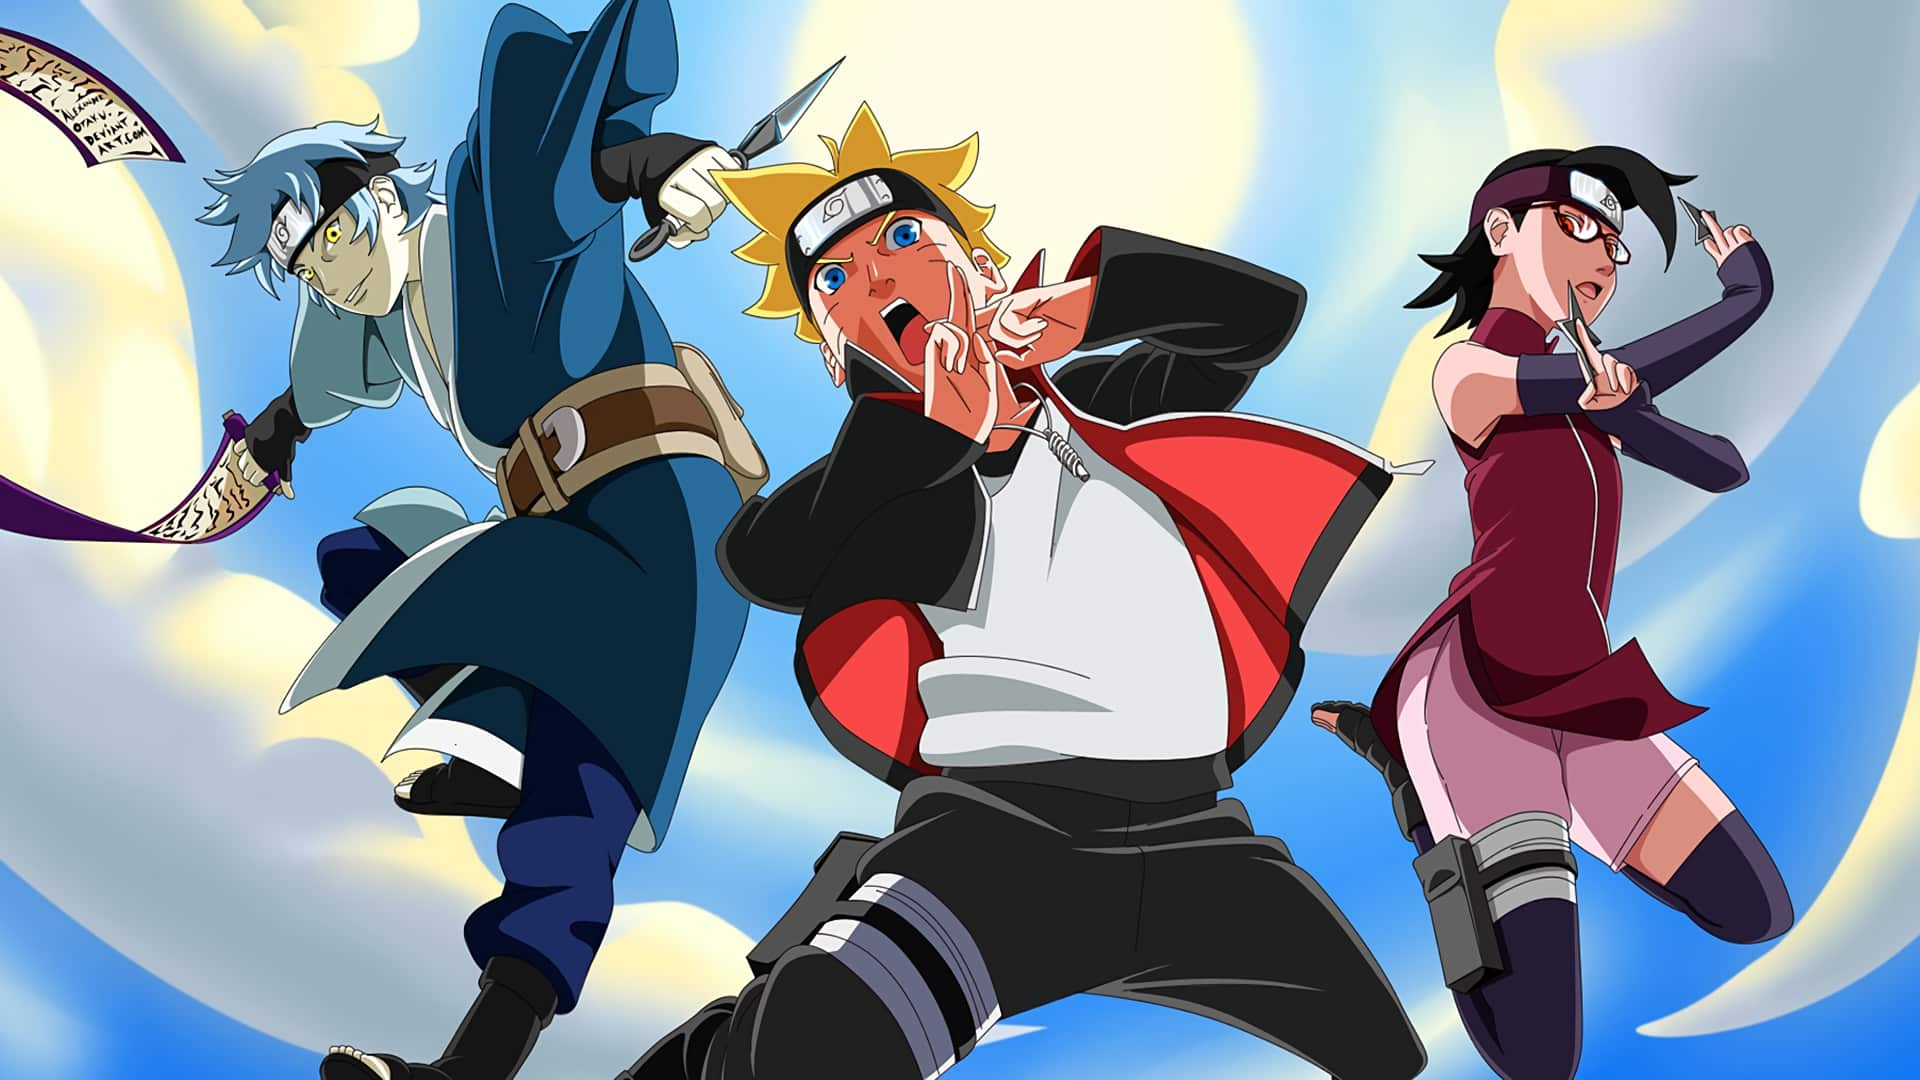 Boruto Naruto Next Generations Wallpapers - Top Free Boruto